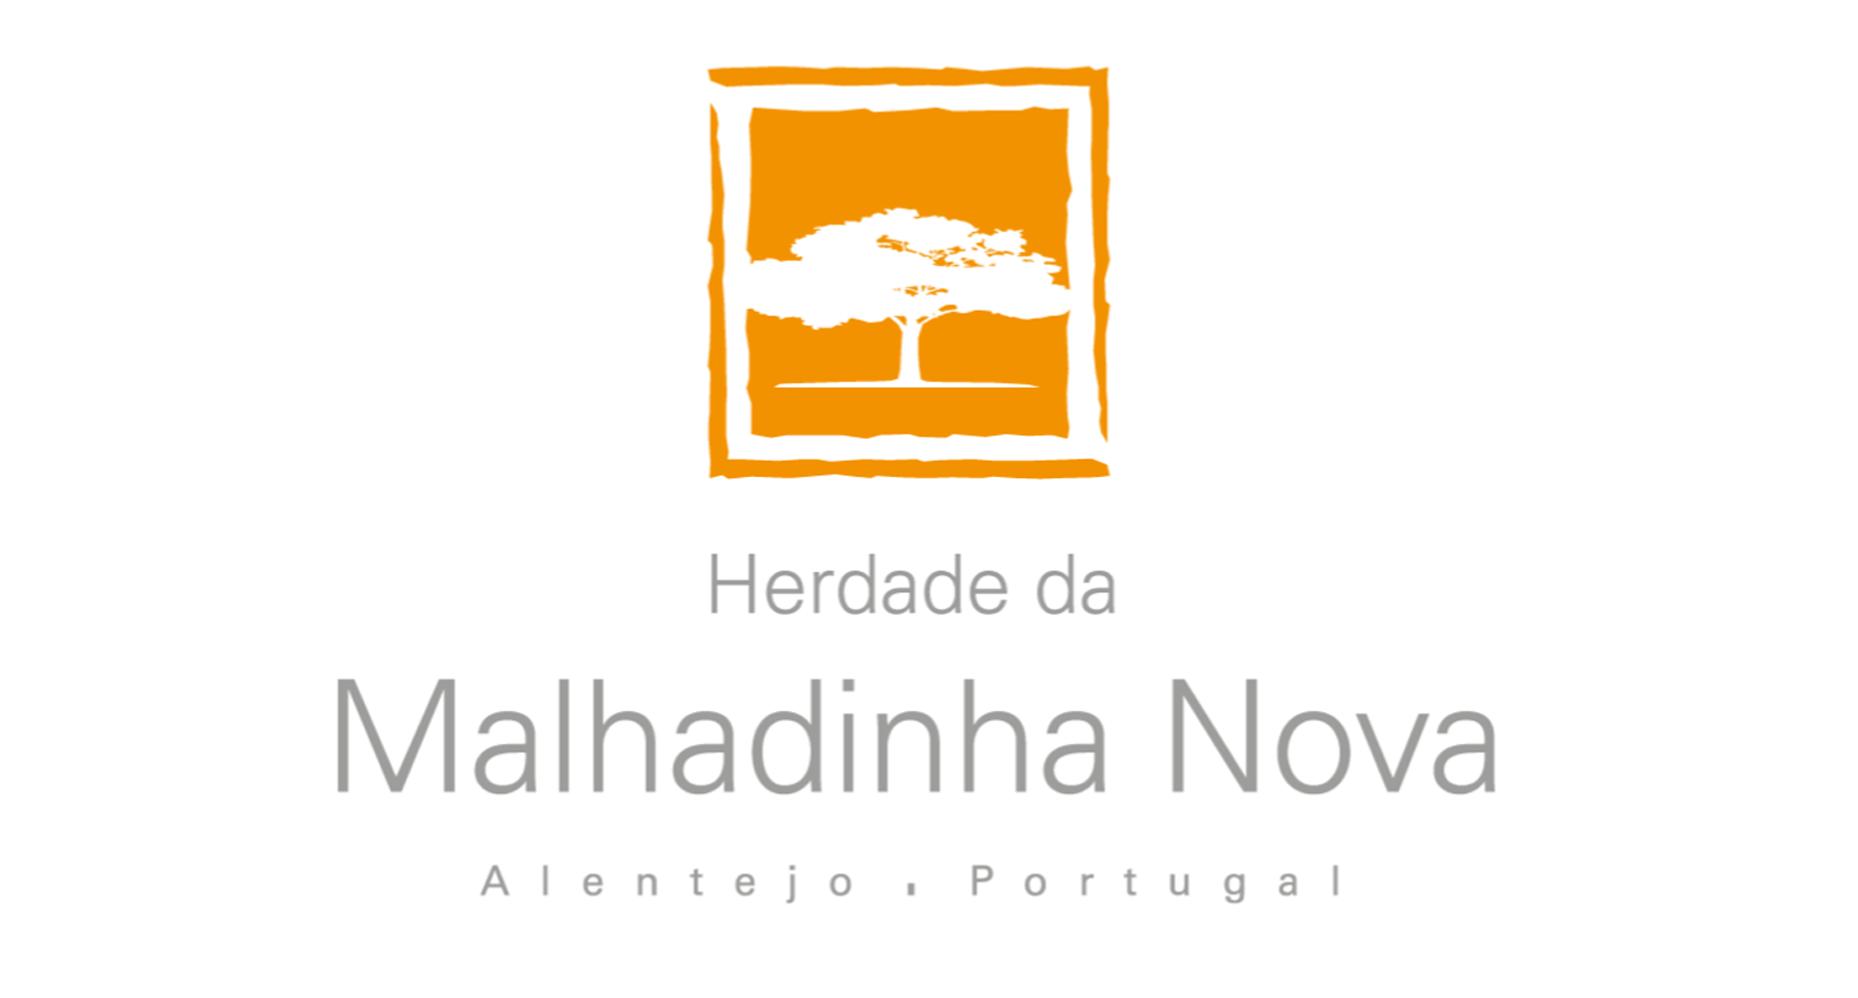 Malhadinha Nova